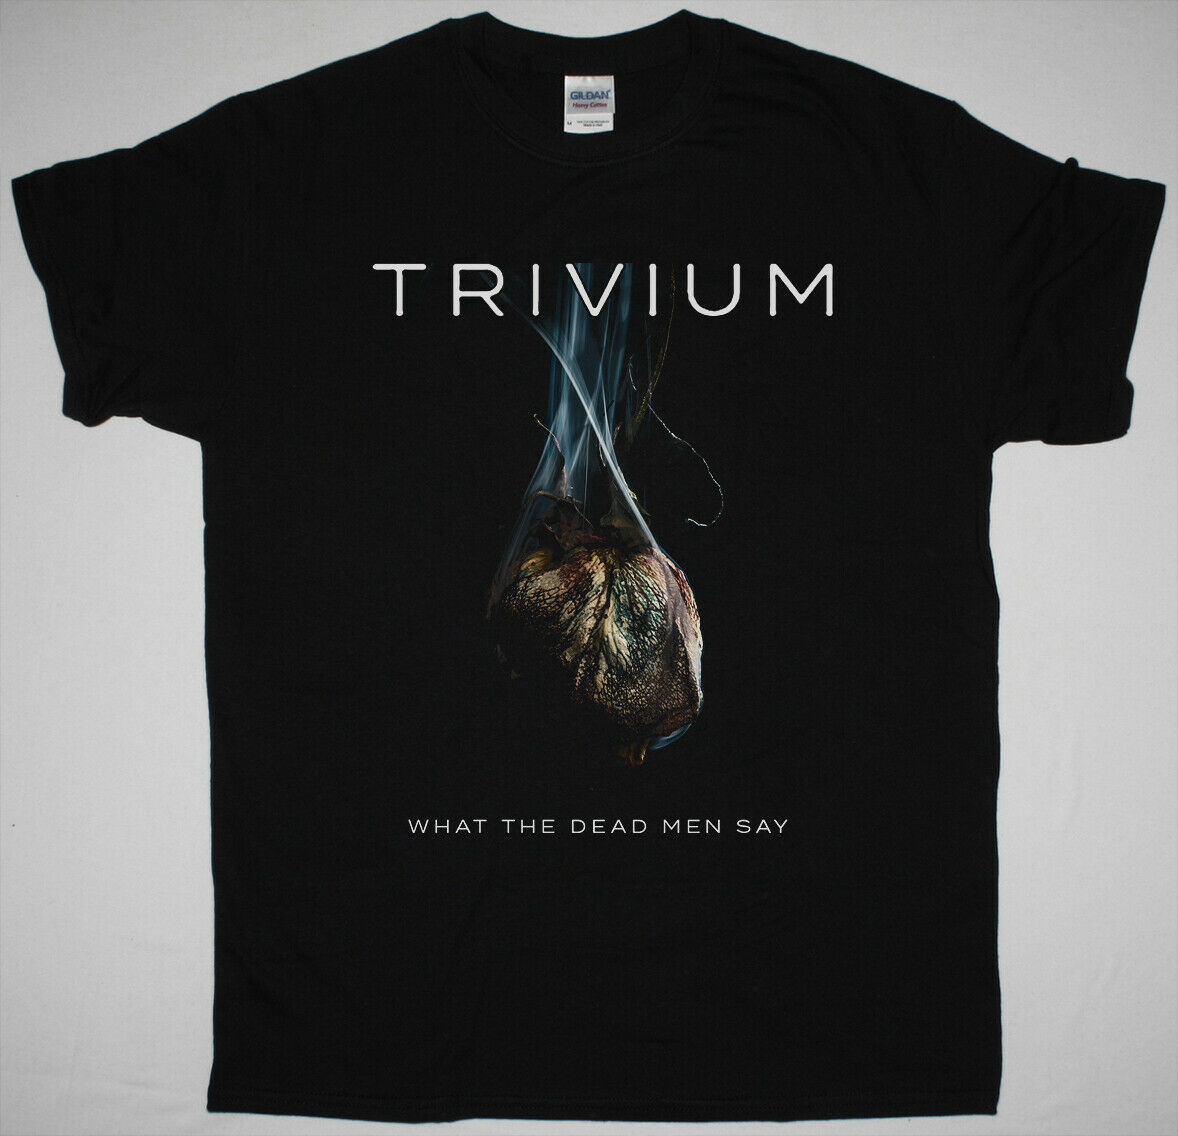 Trivium ¿Qué muerto dicen los hombres negro T camisa como morir compromiso Killswitch